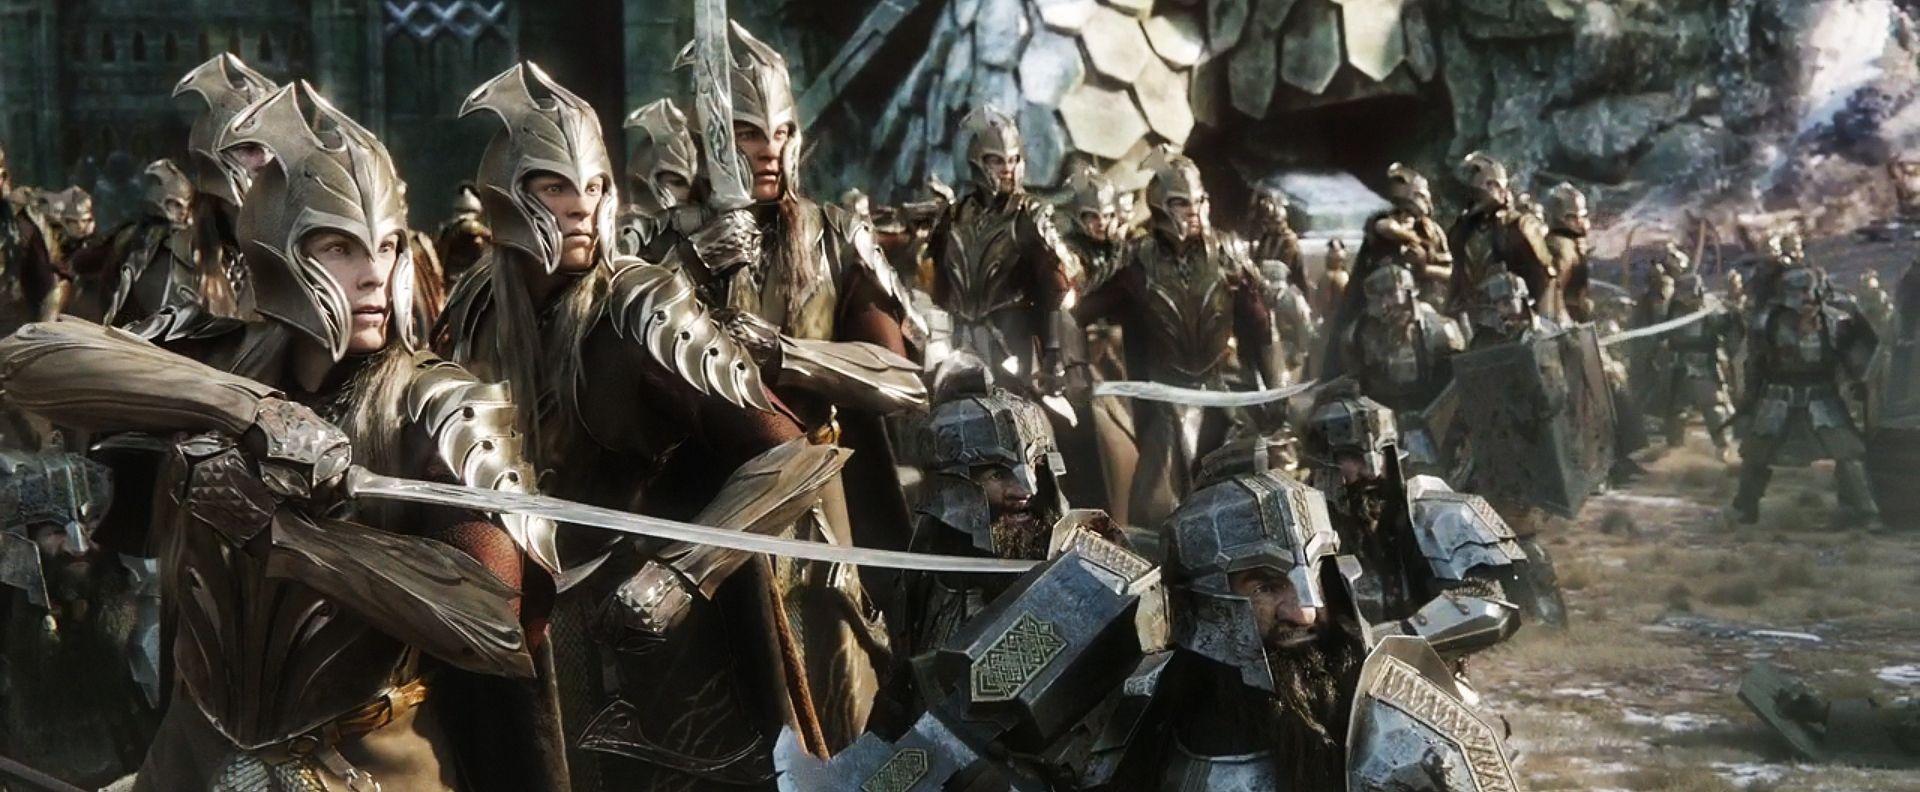 Lothlorien Battles War Of The Ring